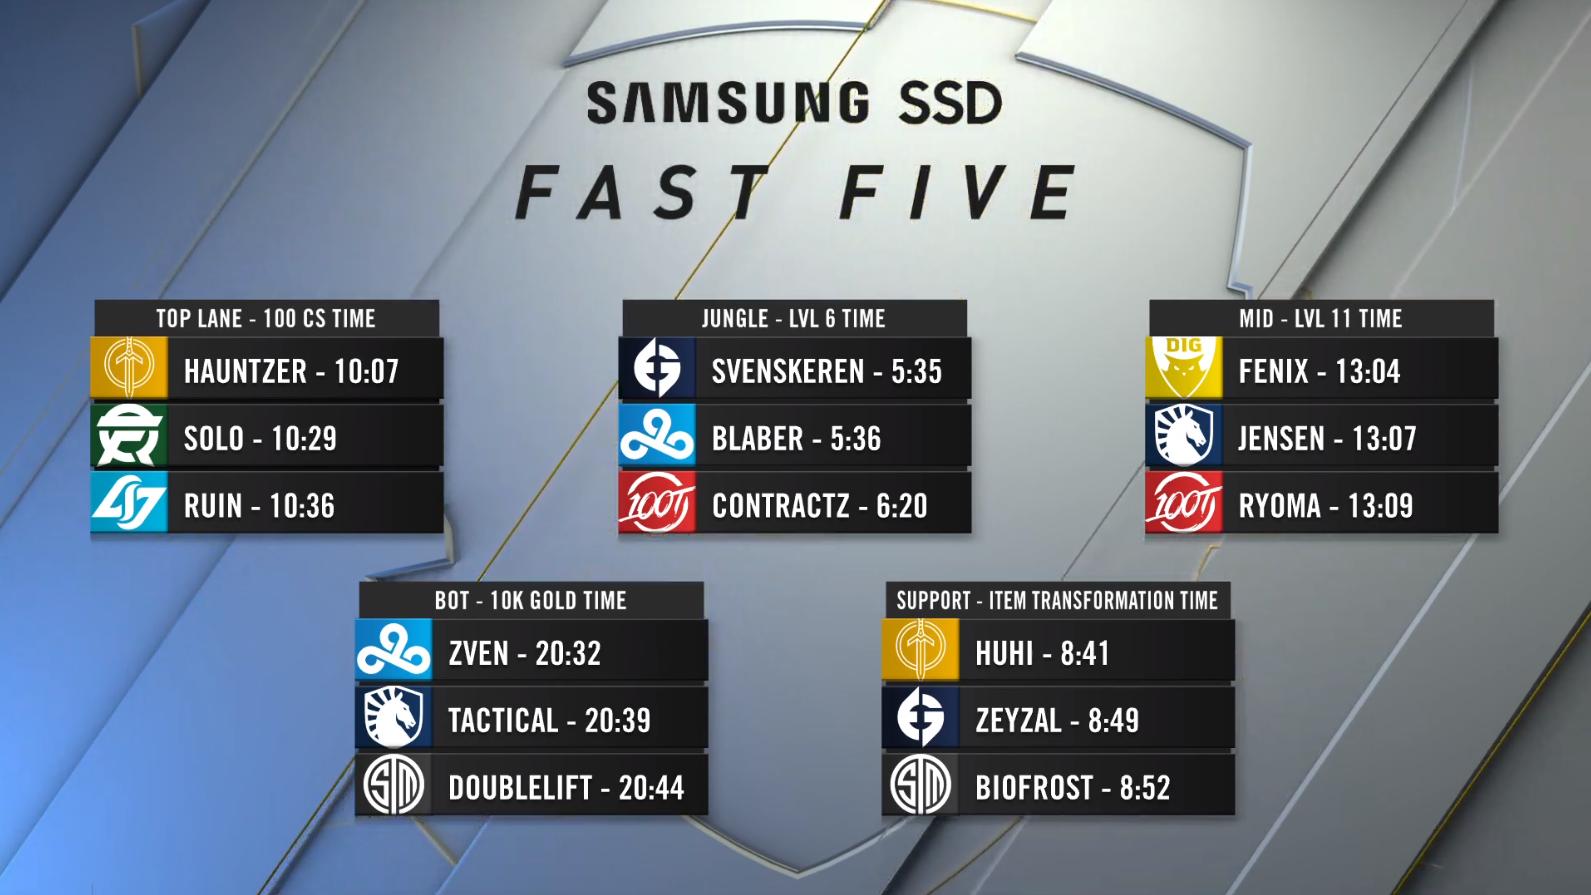 LCS更新五项最快数据:Doublelift被超越 打野位无变化